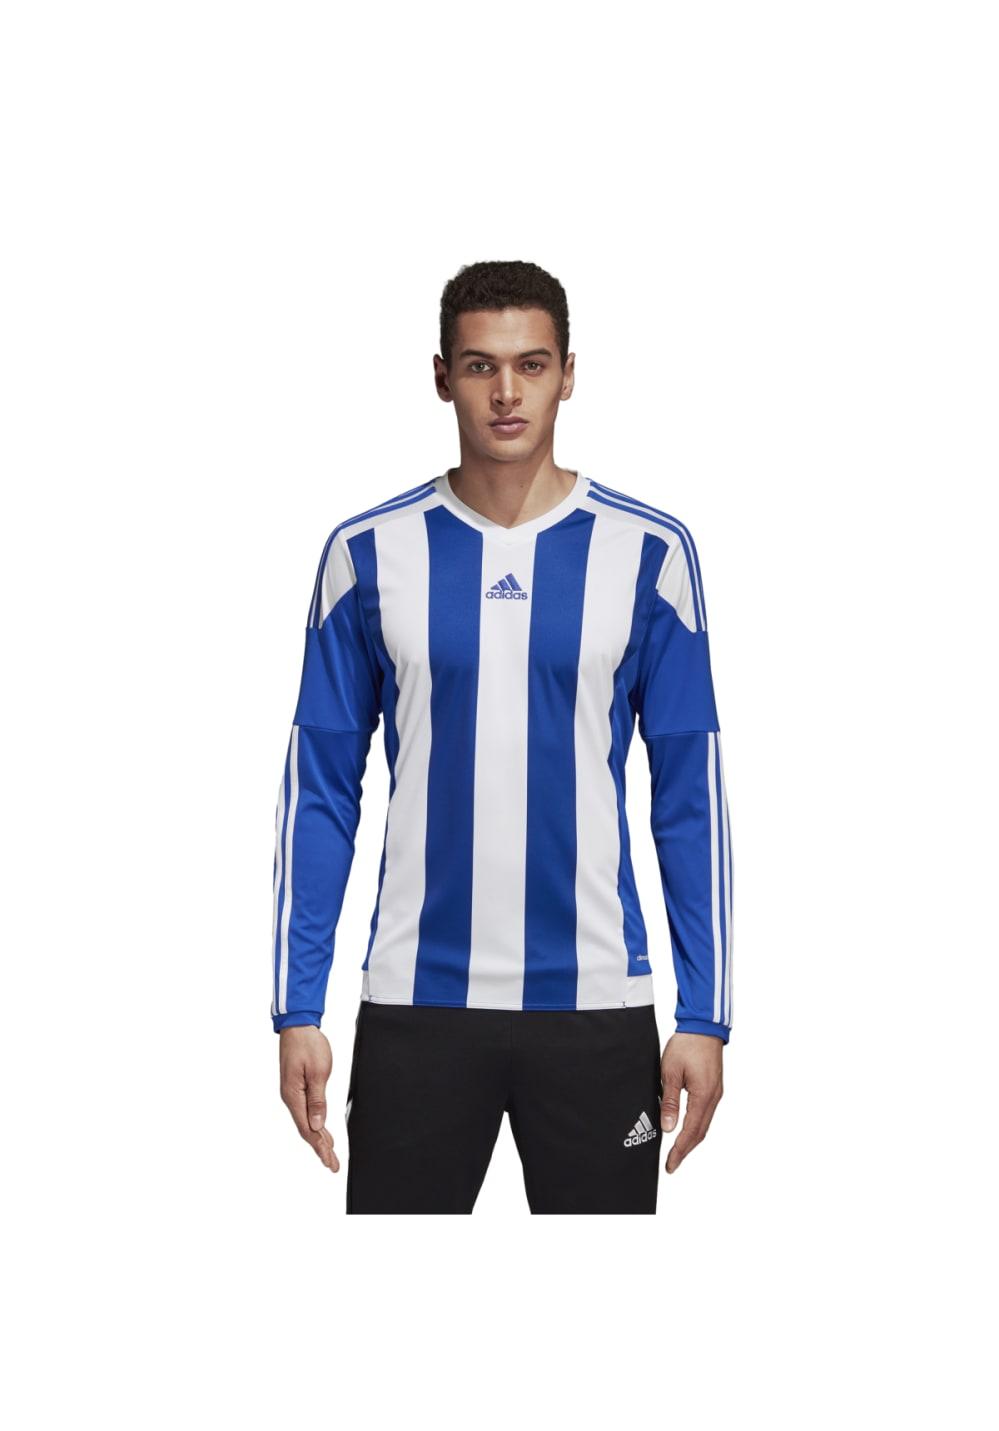 adidas STRIPED15 JSY L Fitnessshirts für Herren Blau | 21RUN